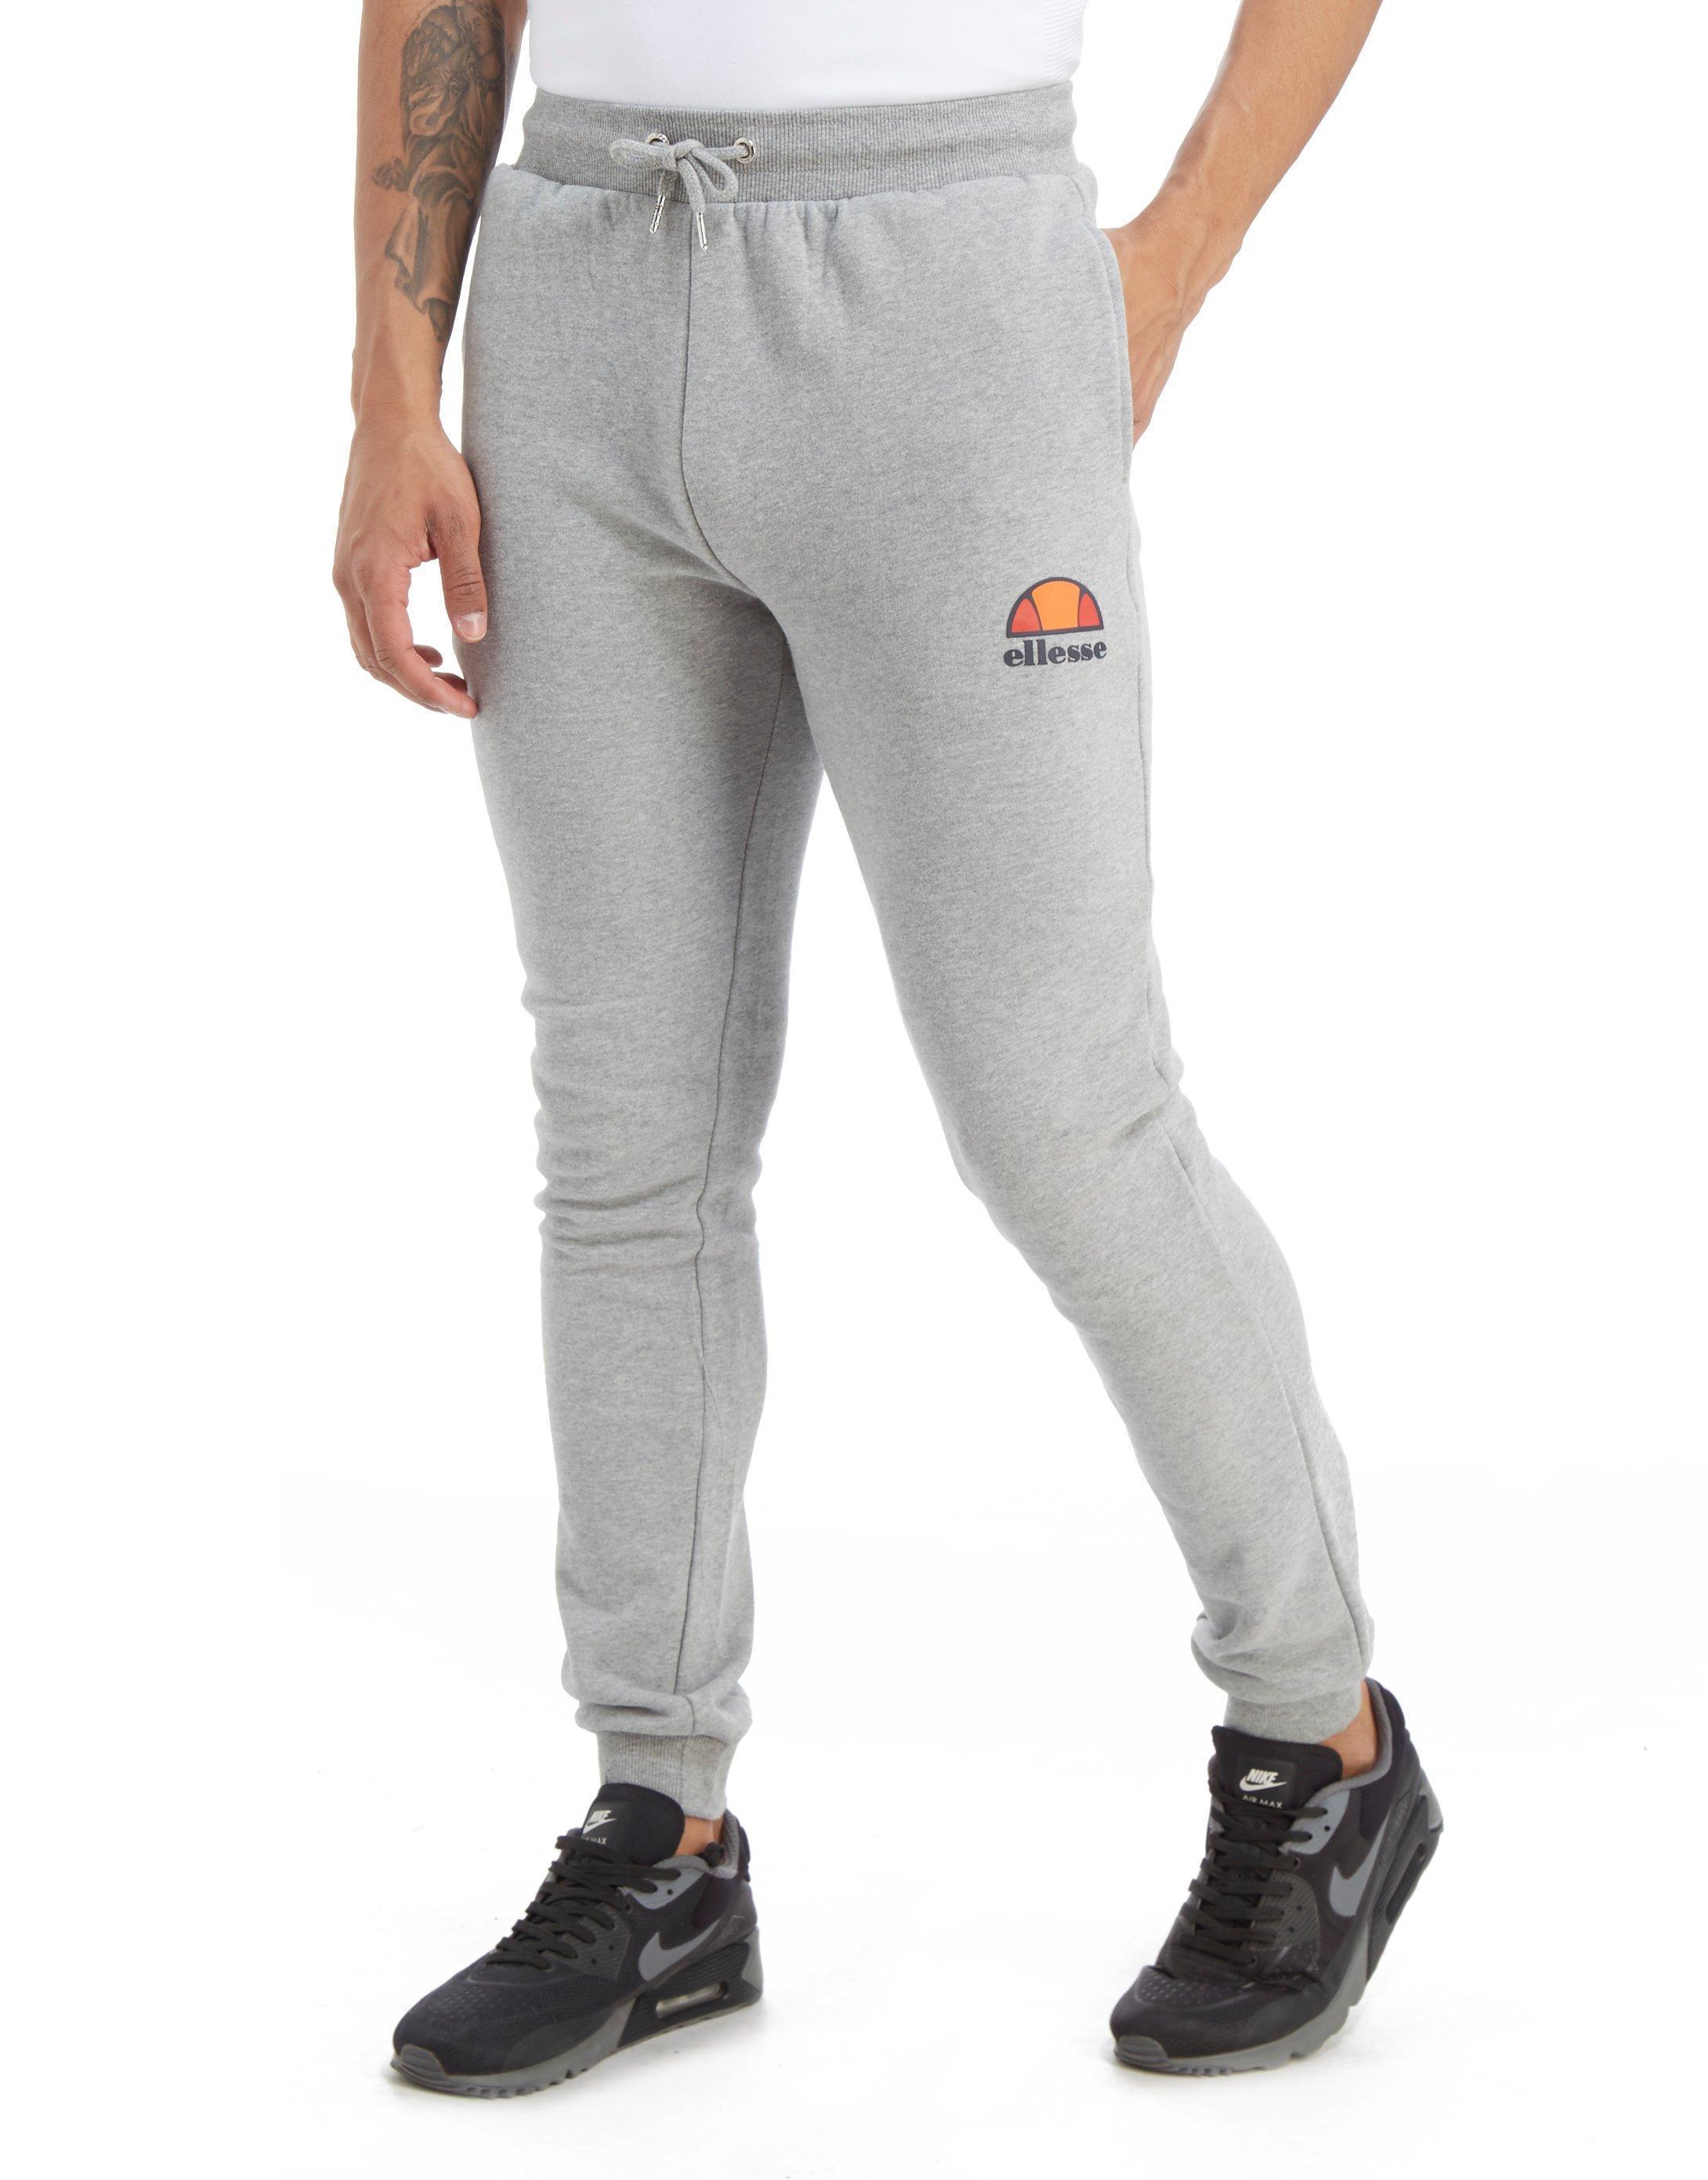 sklep dyskontowy nowe obrazy najlepsza wartość Ellesse Gray Ovest Jogger Pants for men